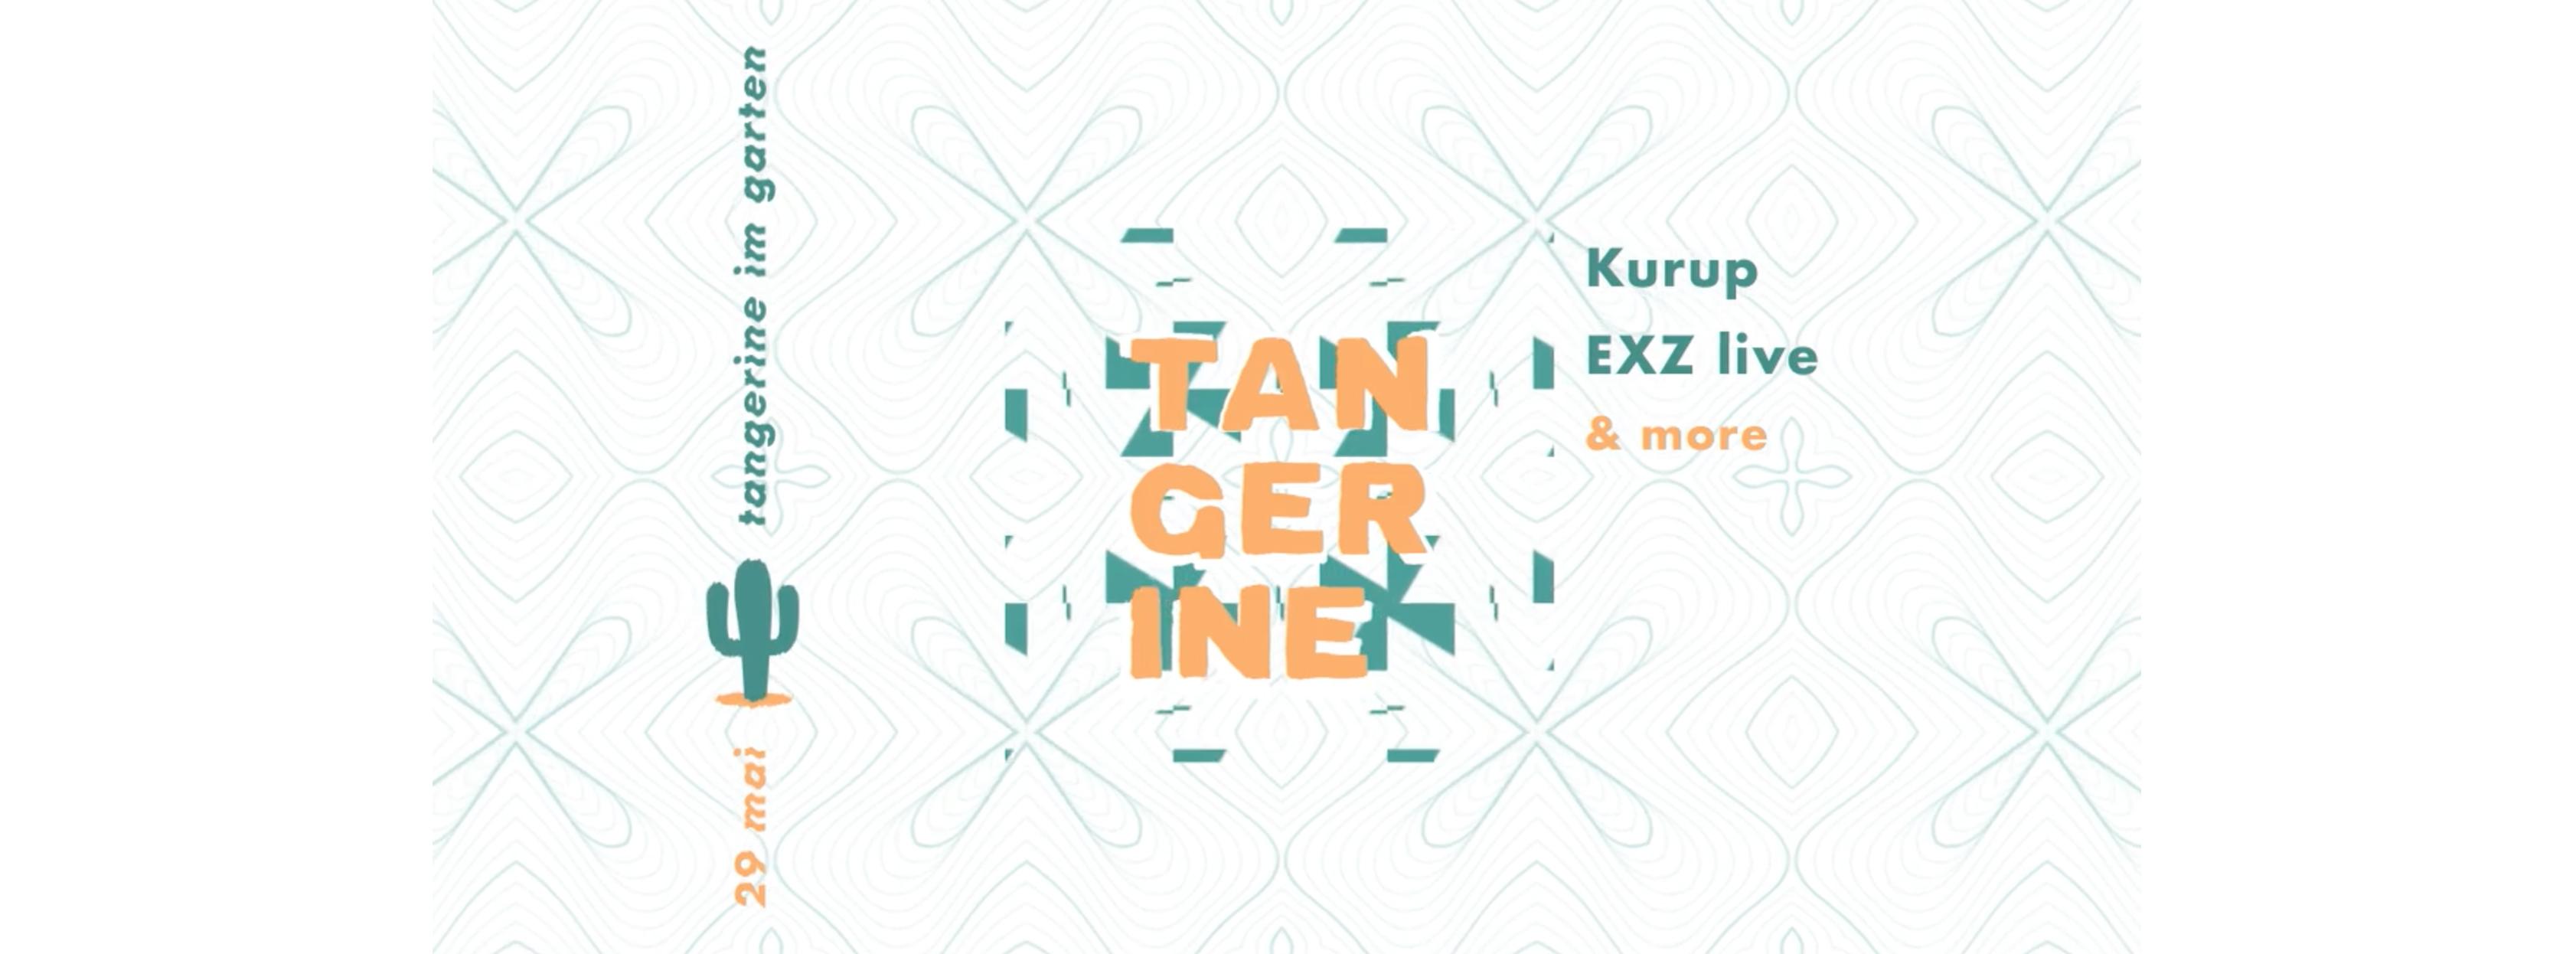 Tangerine im Garten with EXZ & Kurup